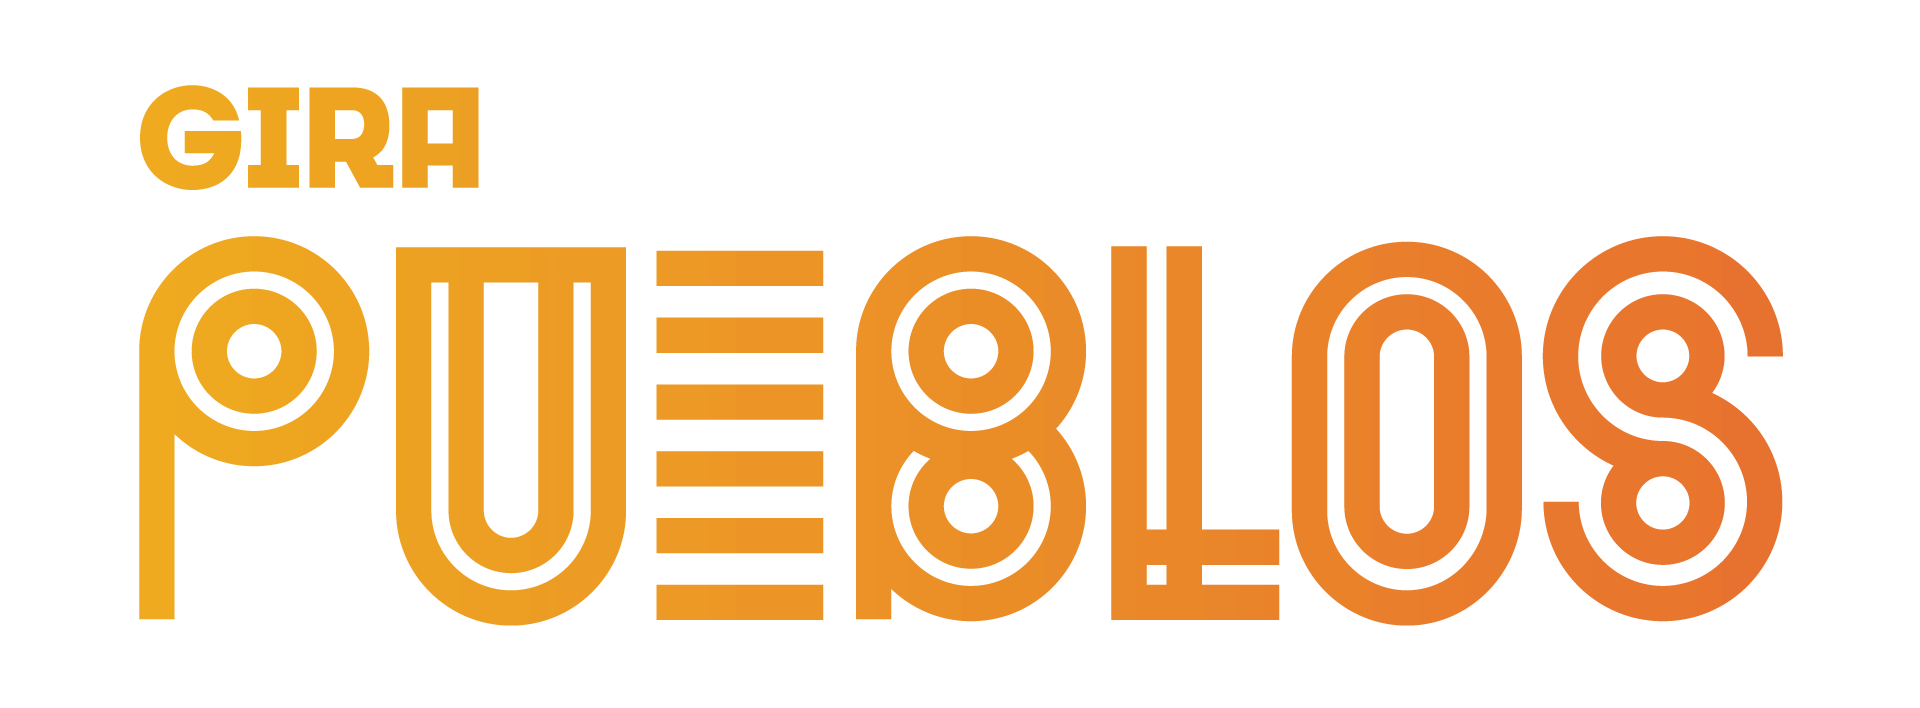 Gira Pueblos